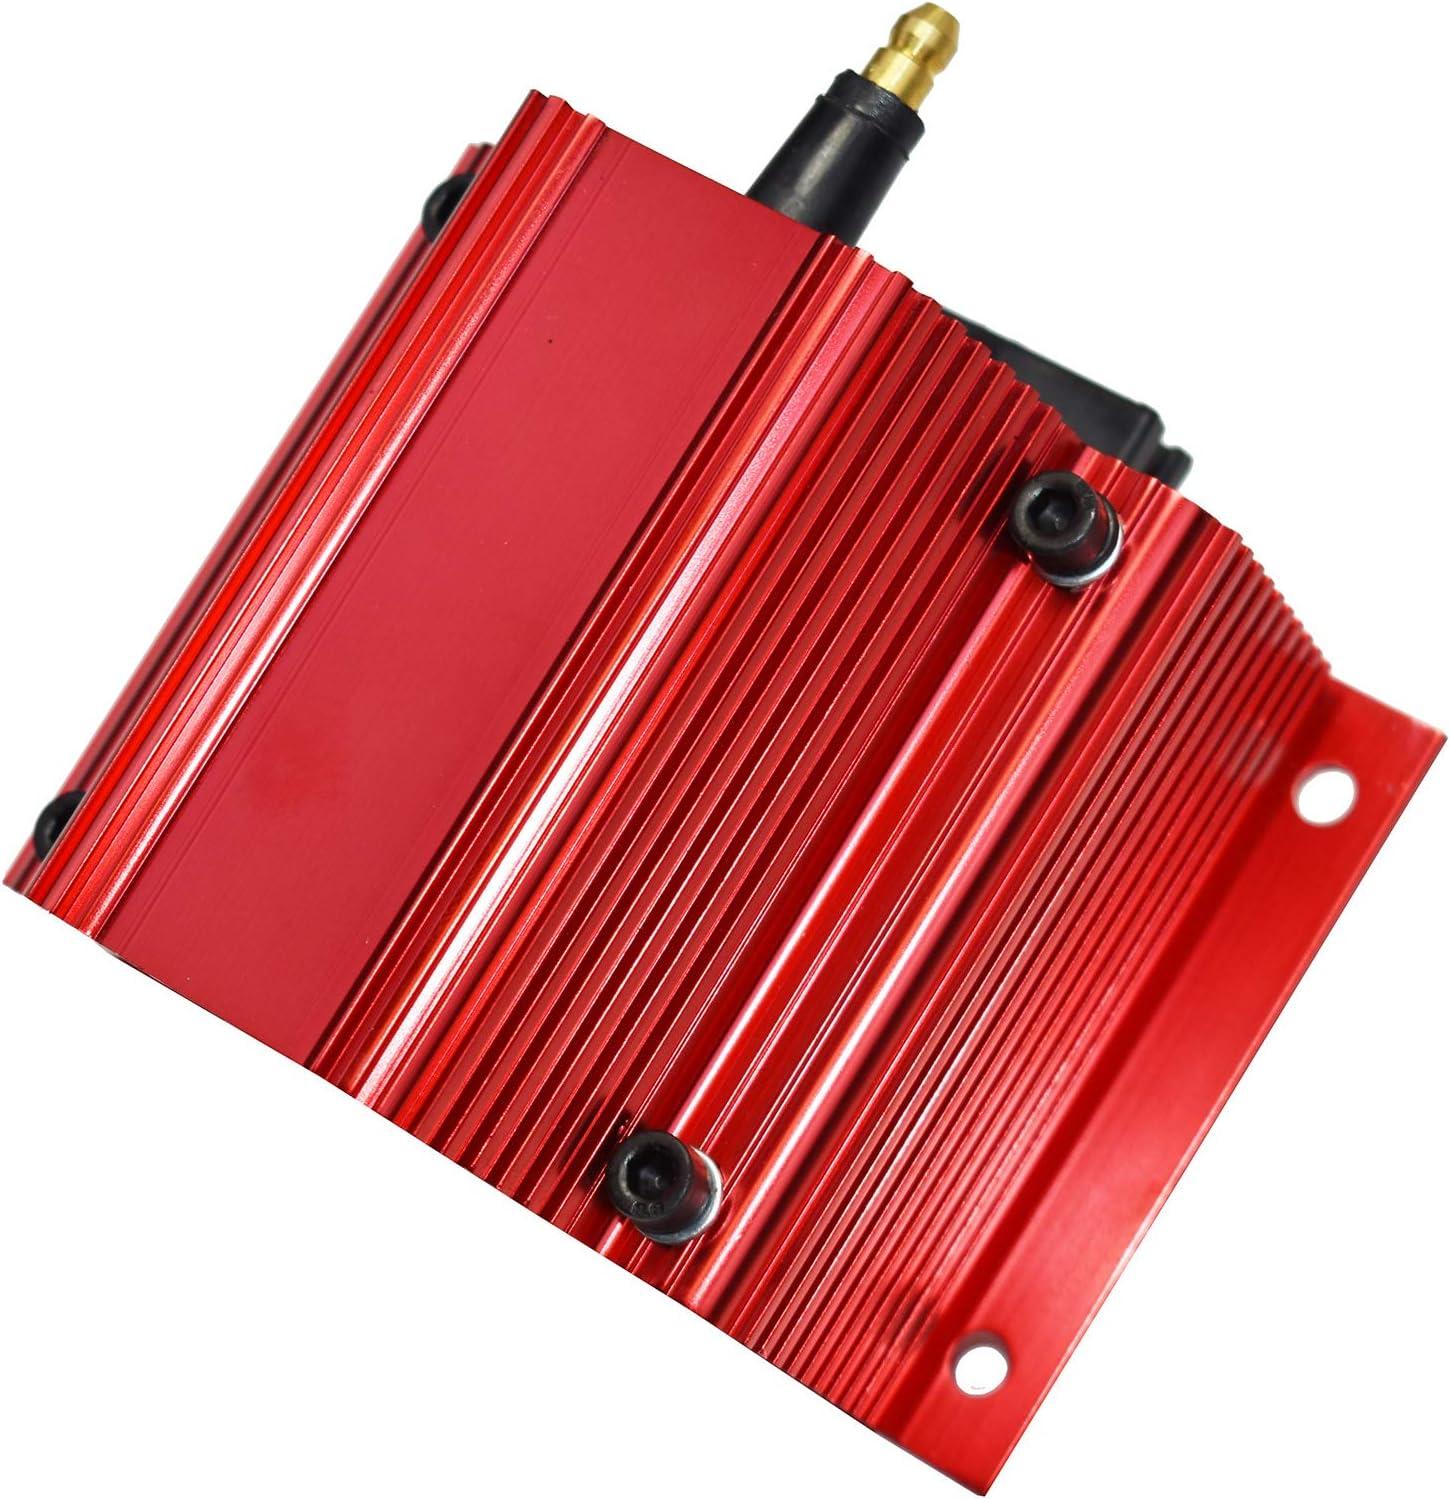 New A-Team Performance E-Core Ignition Coil Remote Billet Aluminum Male E-Coil 50,000 Volts Red